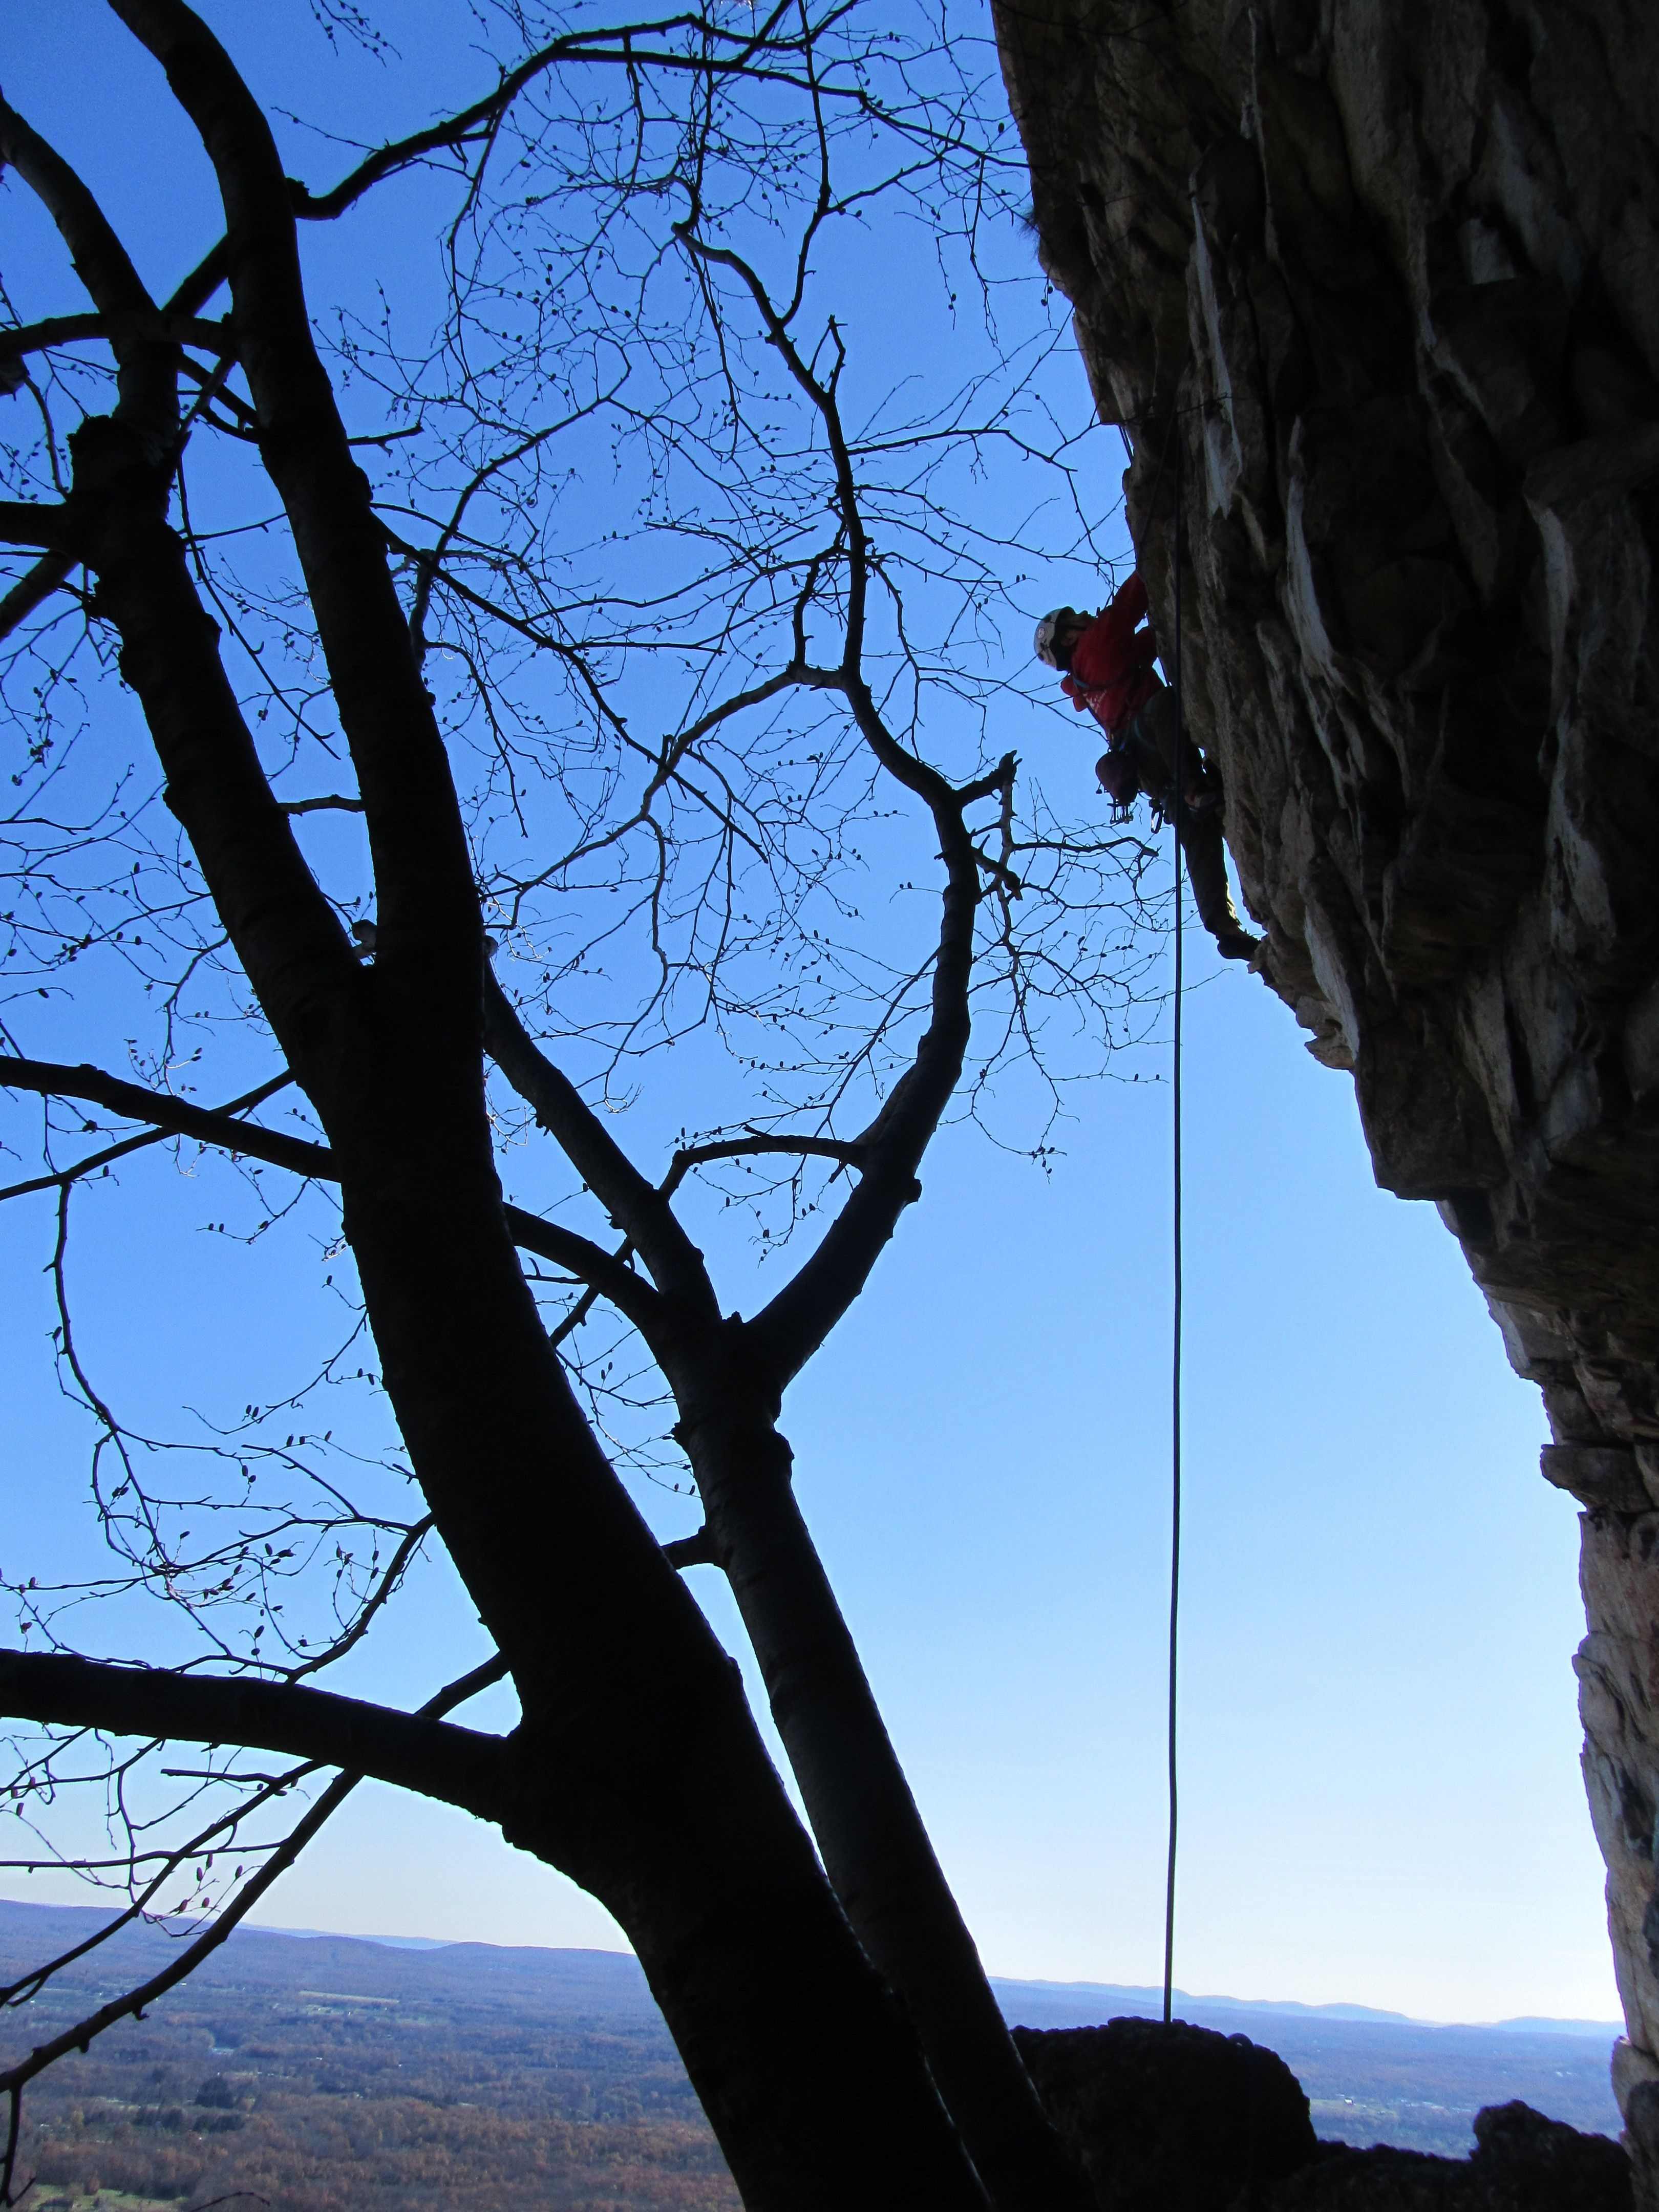 NYC I Wanna Learn Rock Climbing But Not Alone!